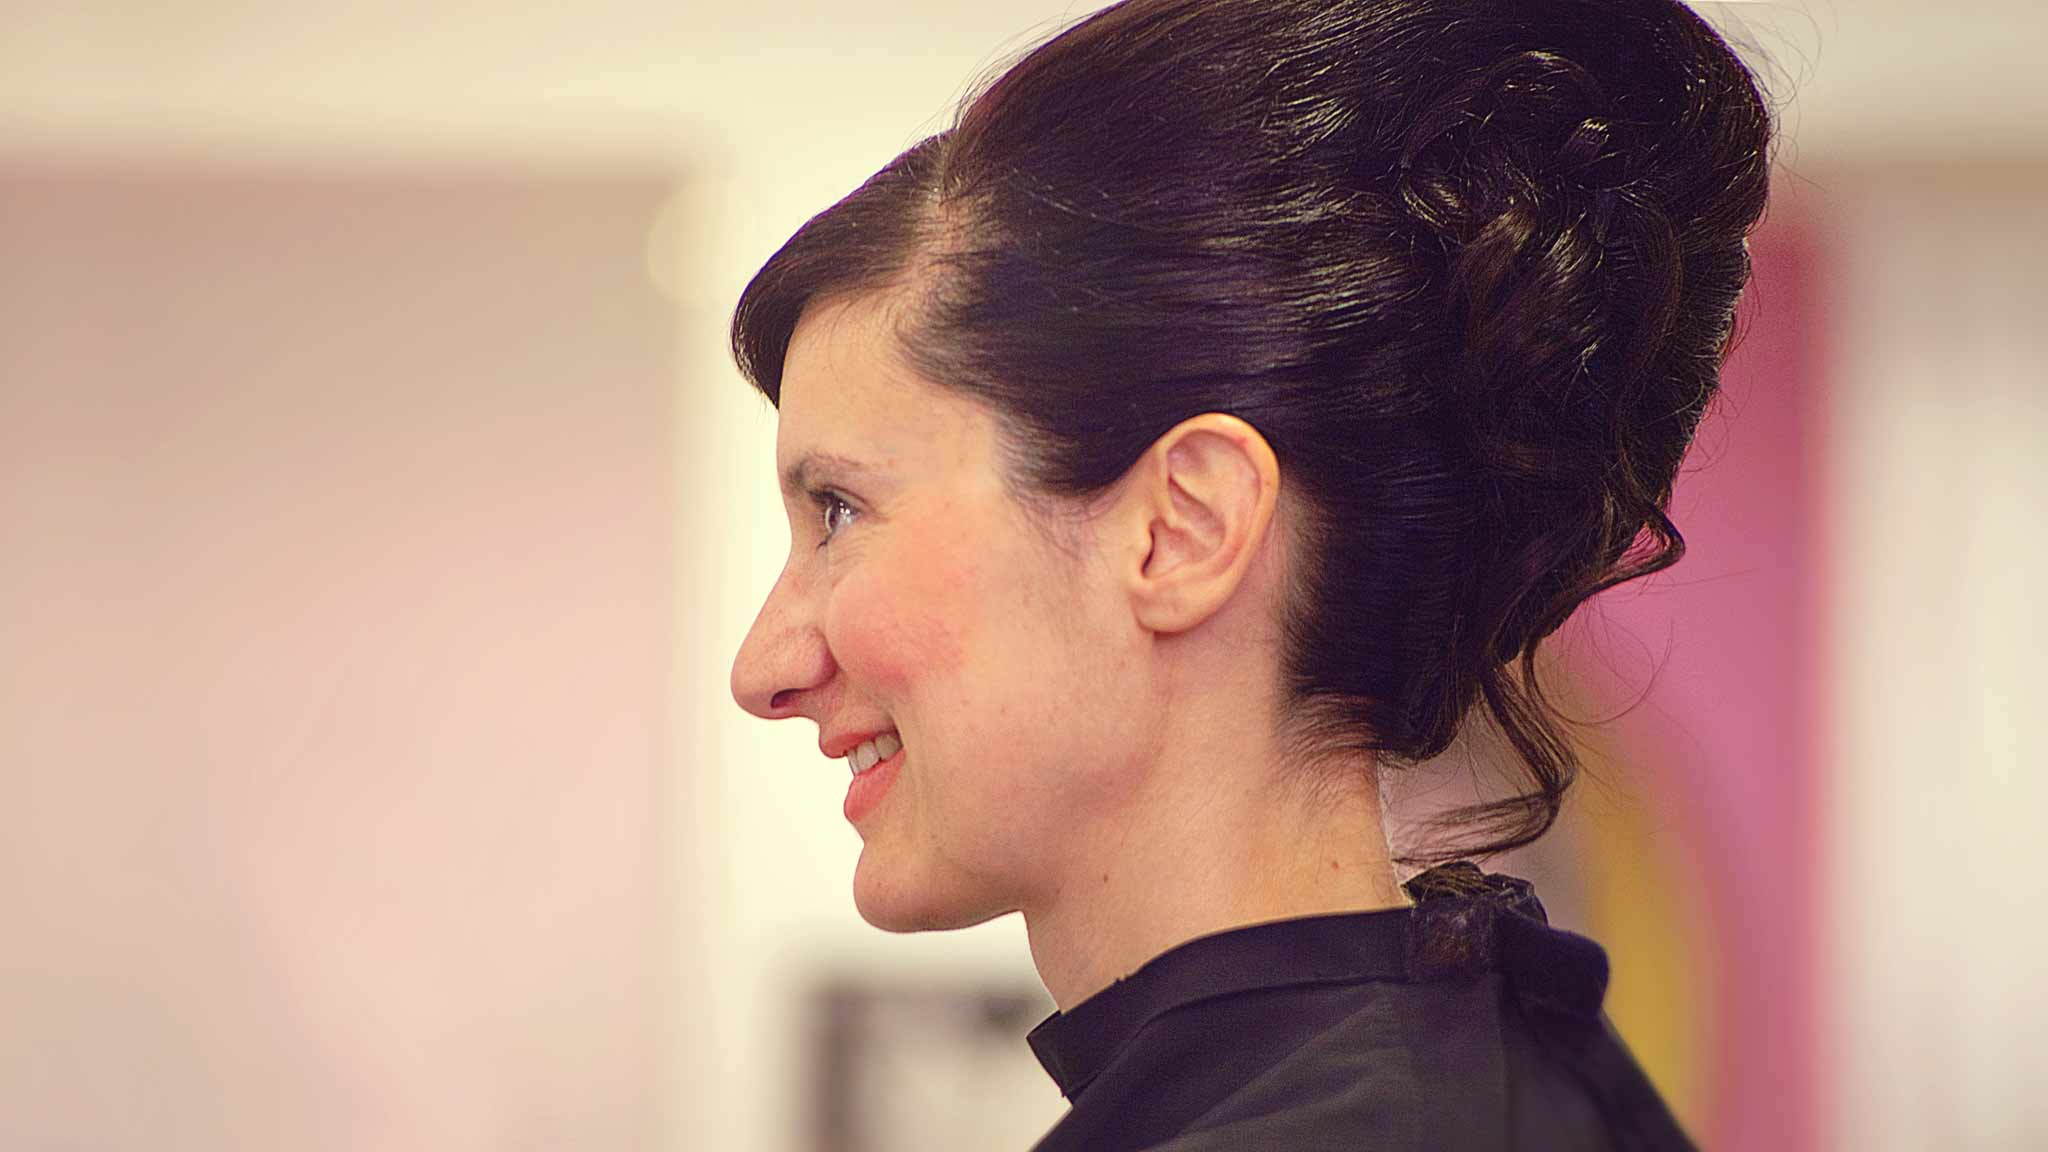 preparation-coiffure-instant-lifestyle-sourire-photographe-mariage-vintage